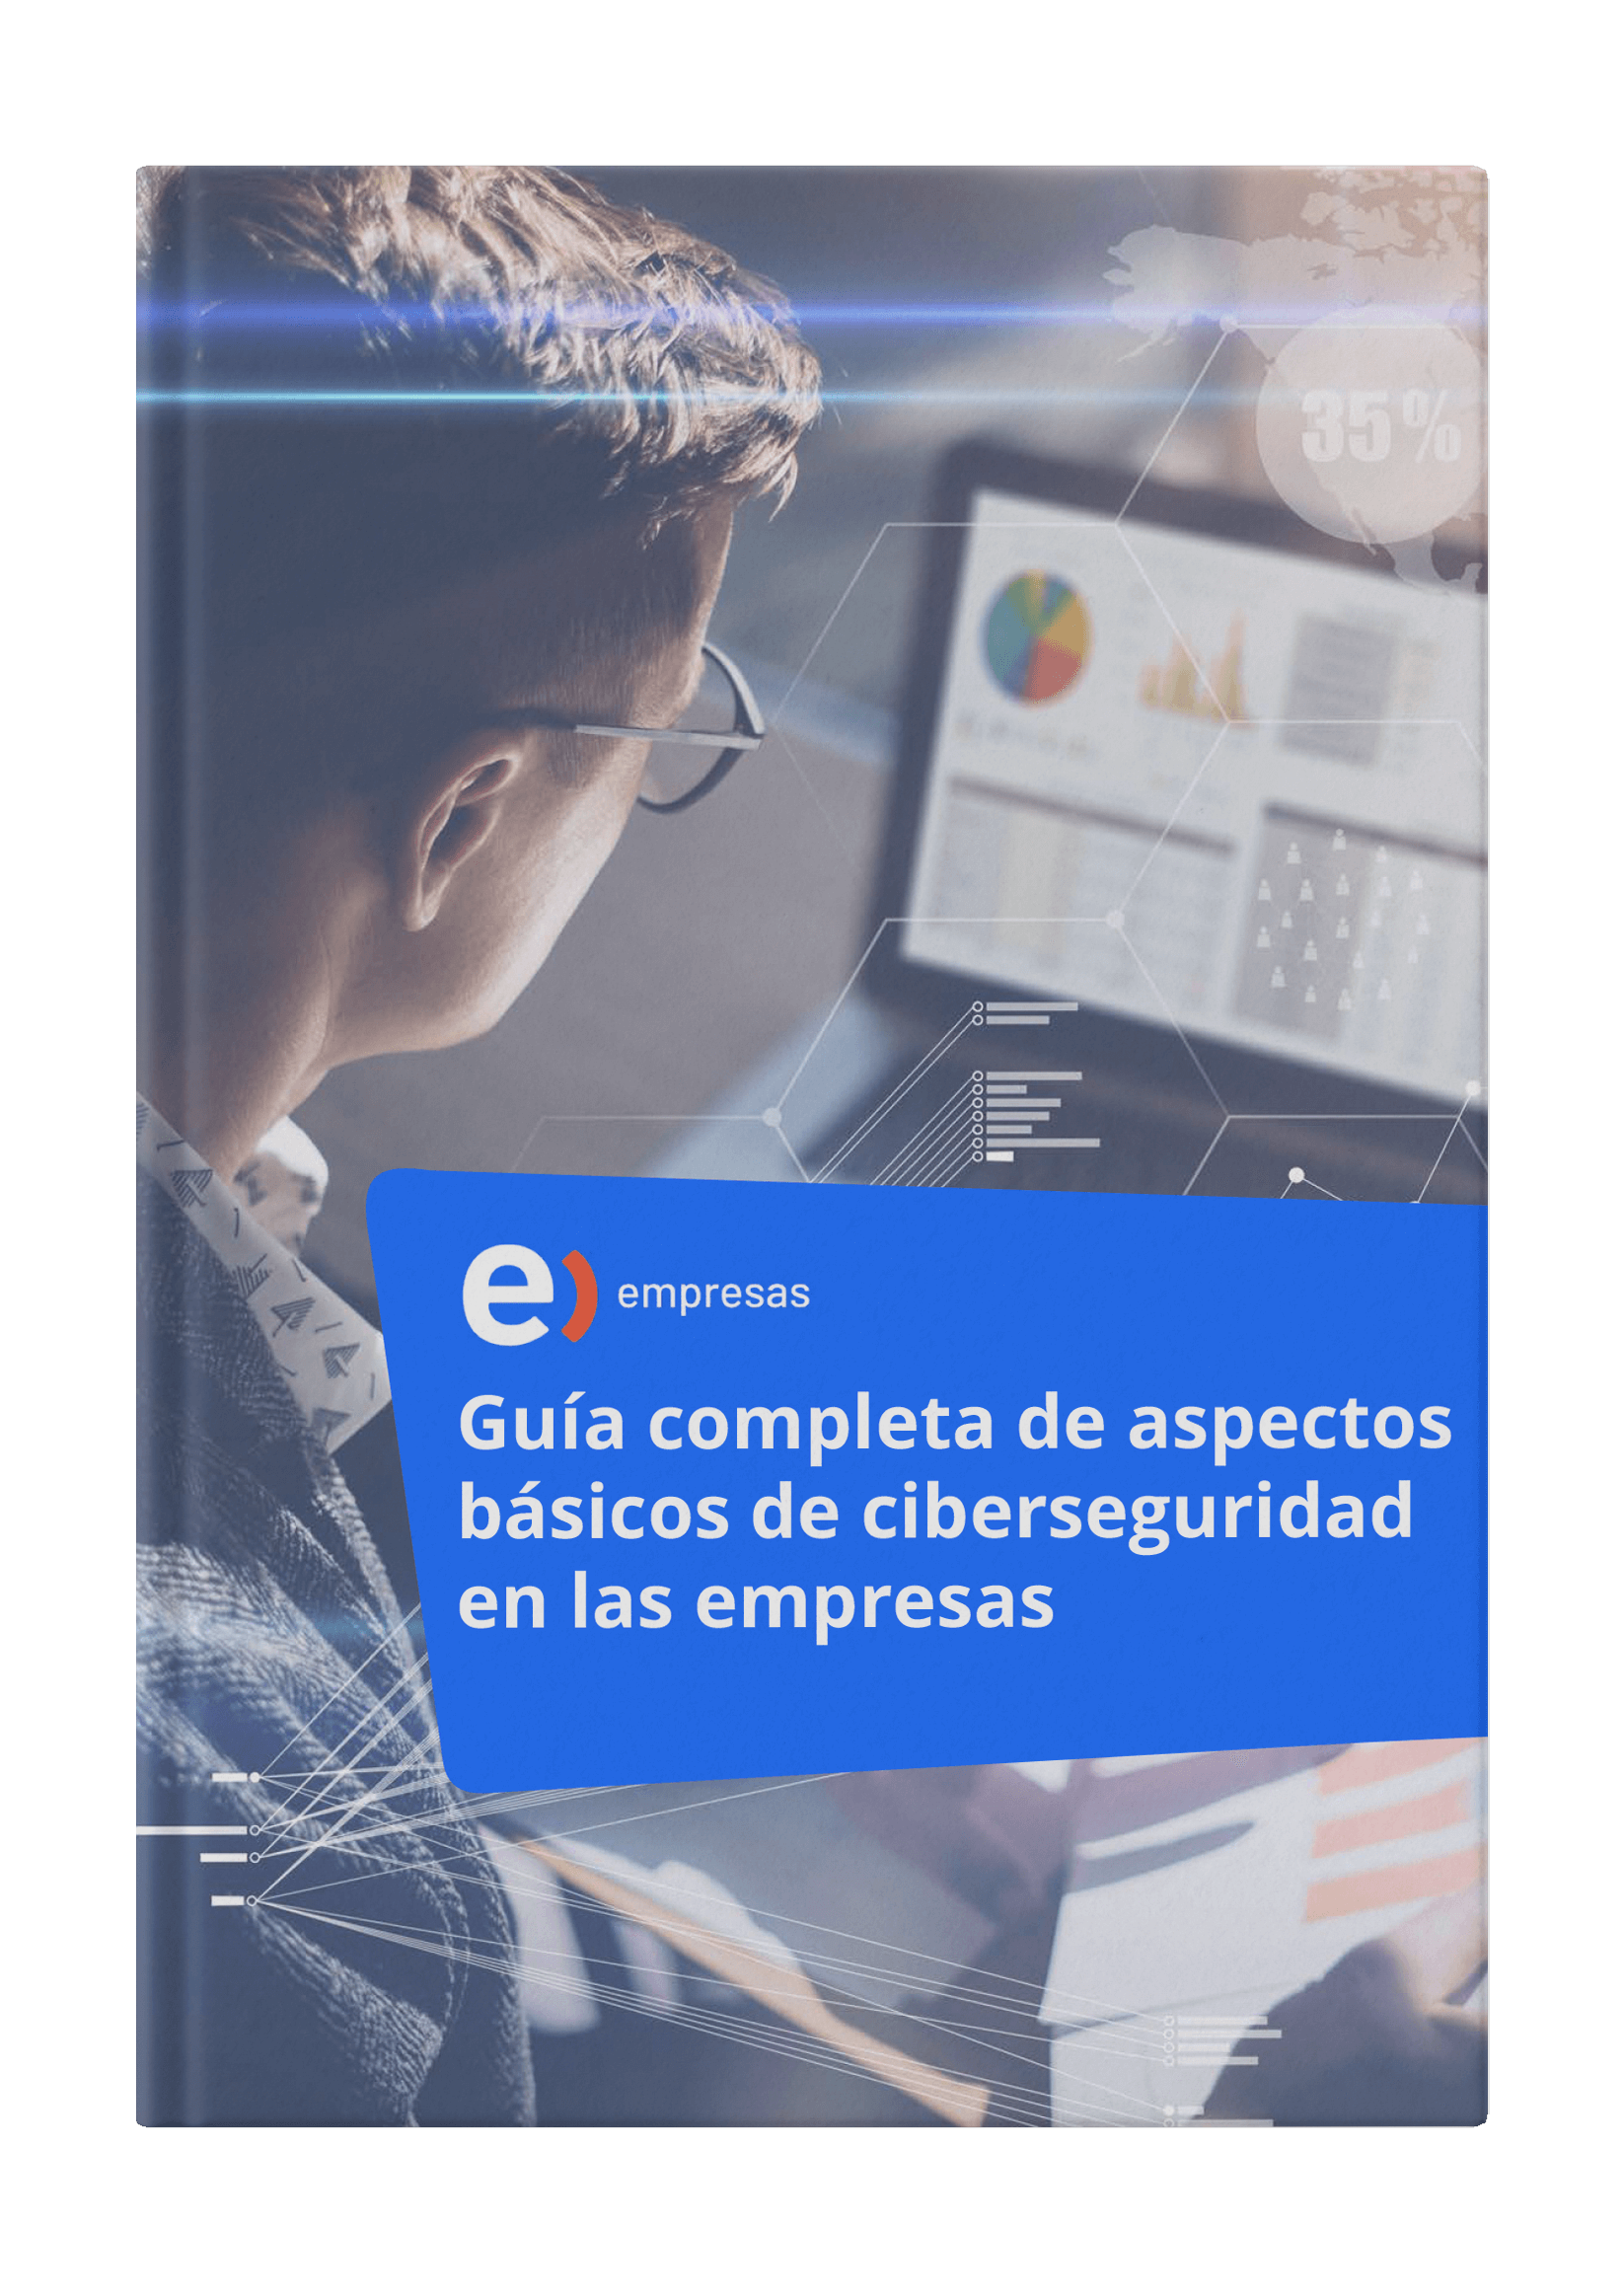 Guía completa de aspectos de ciberseguridad para empresas - Portada 3D